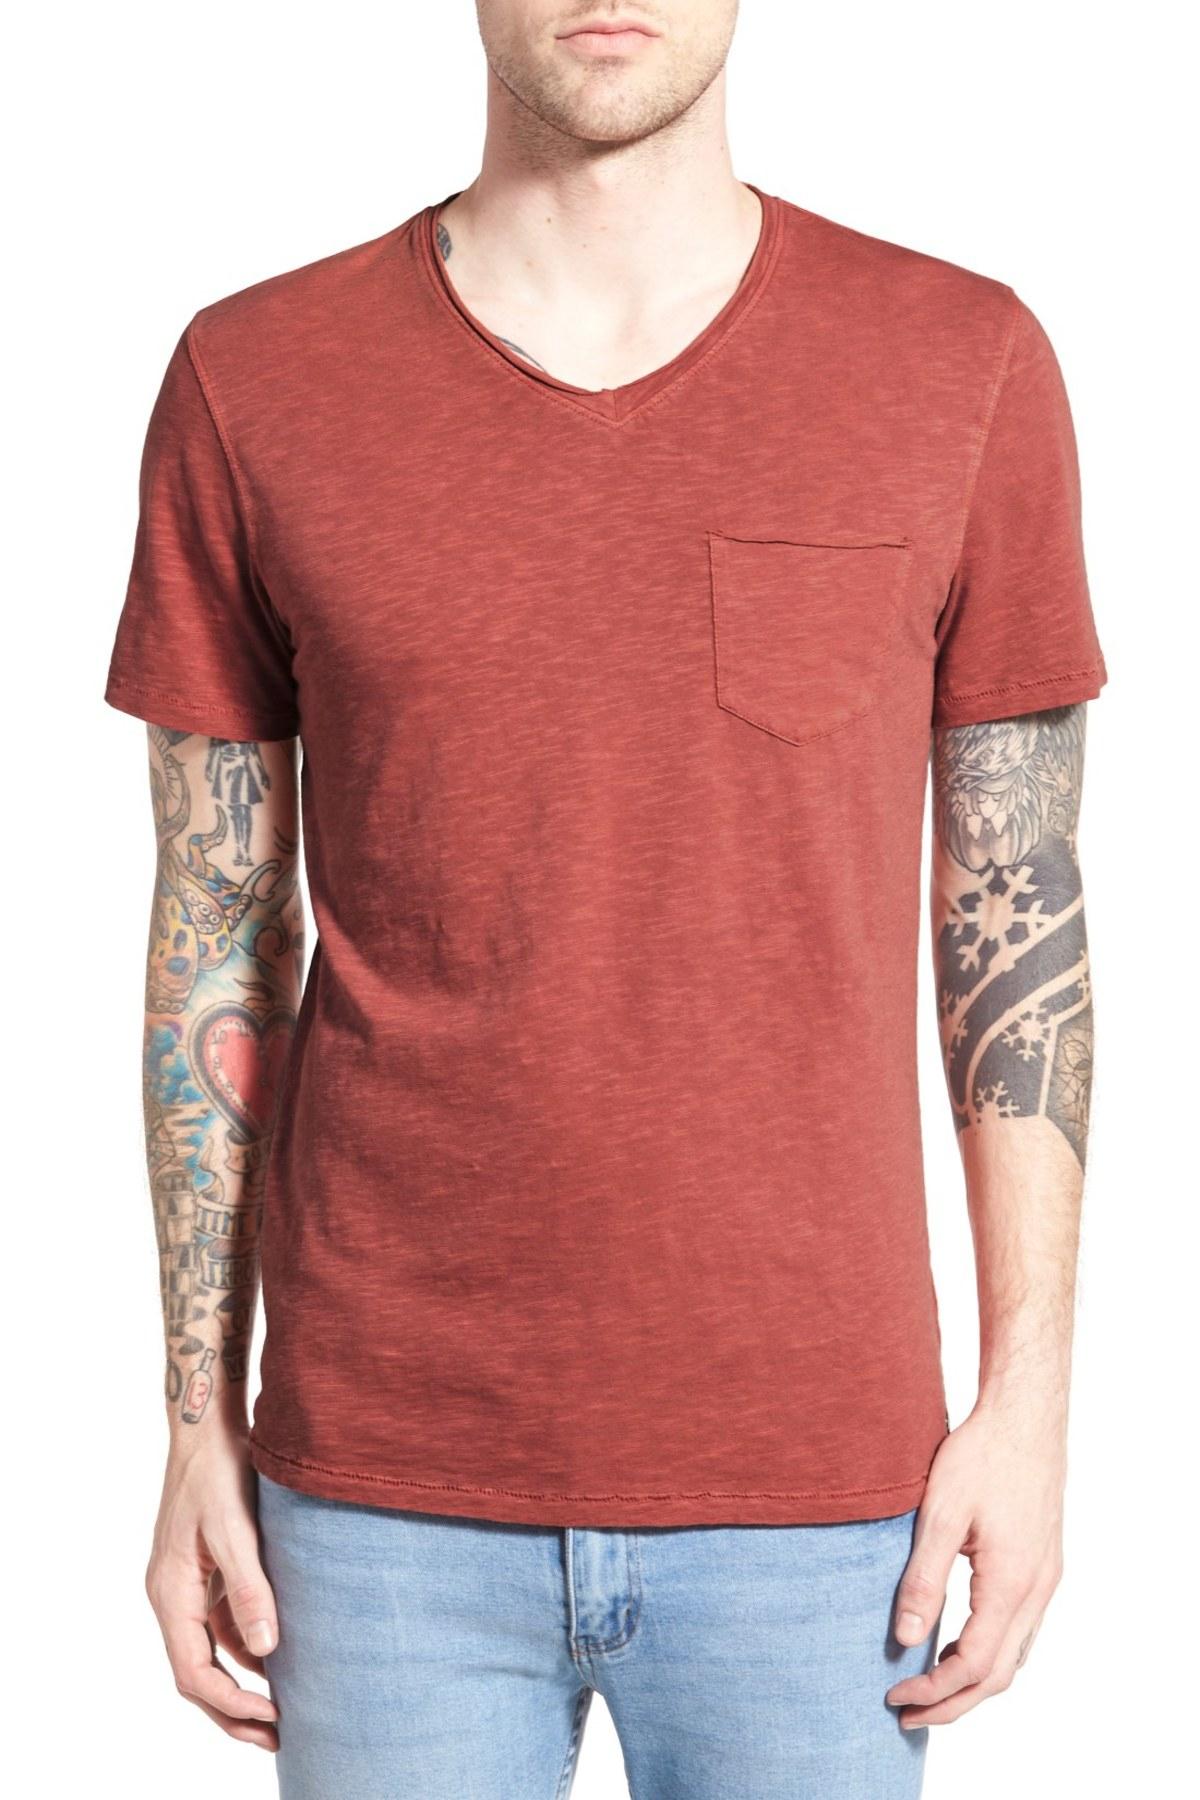 Treasure bond trim fit slub v neck pocket t shirt for for Men s v neck pocket tee shirts